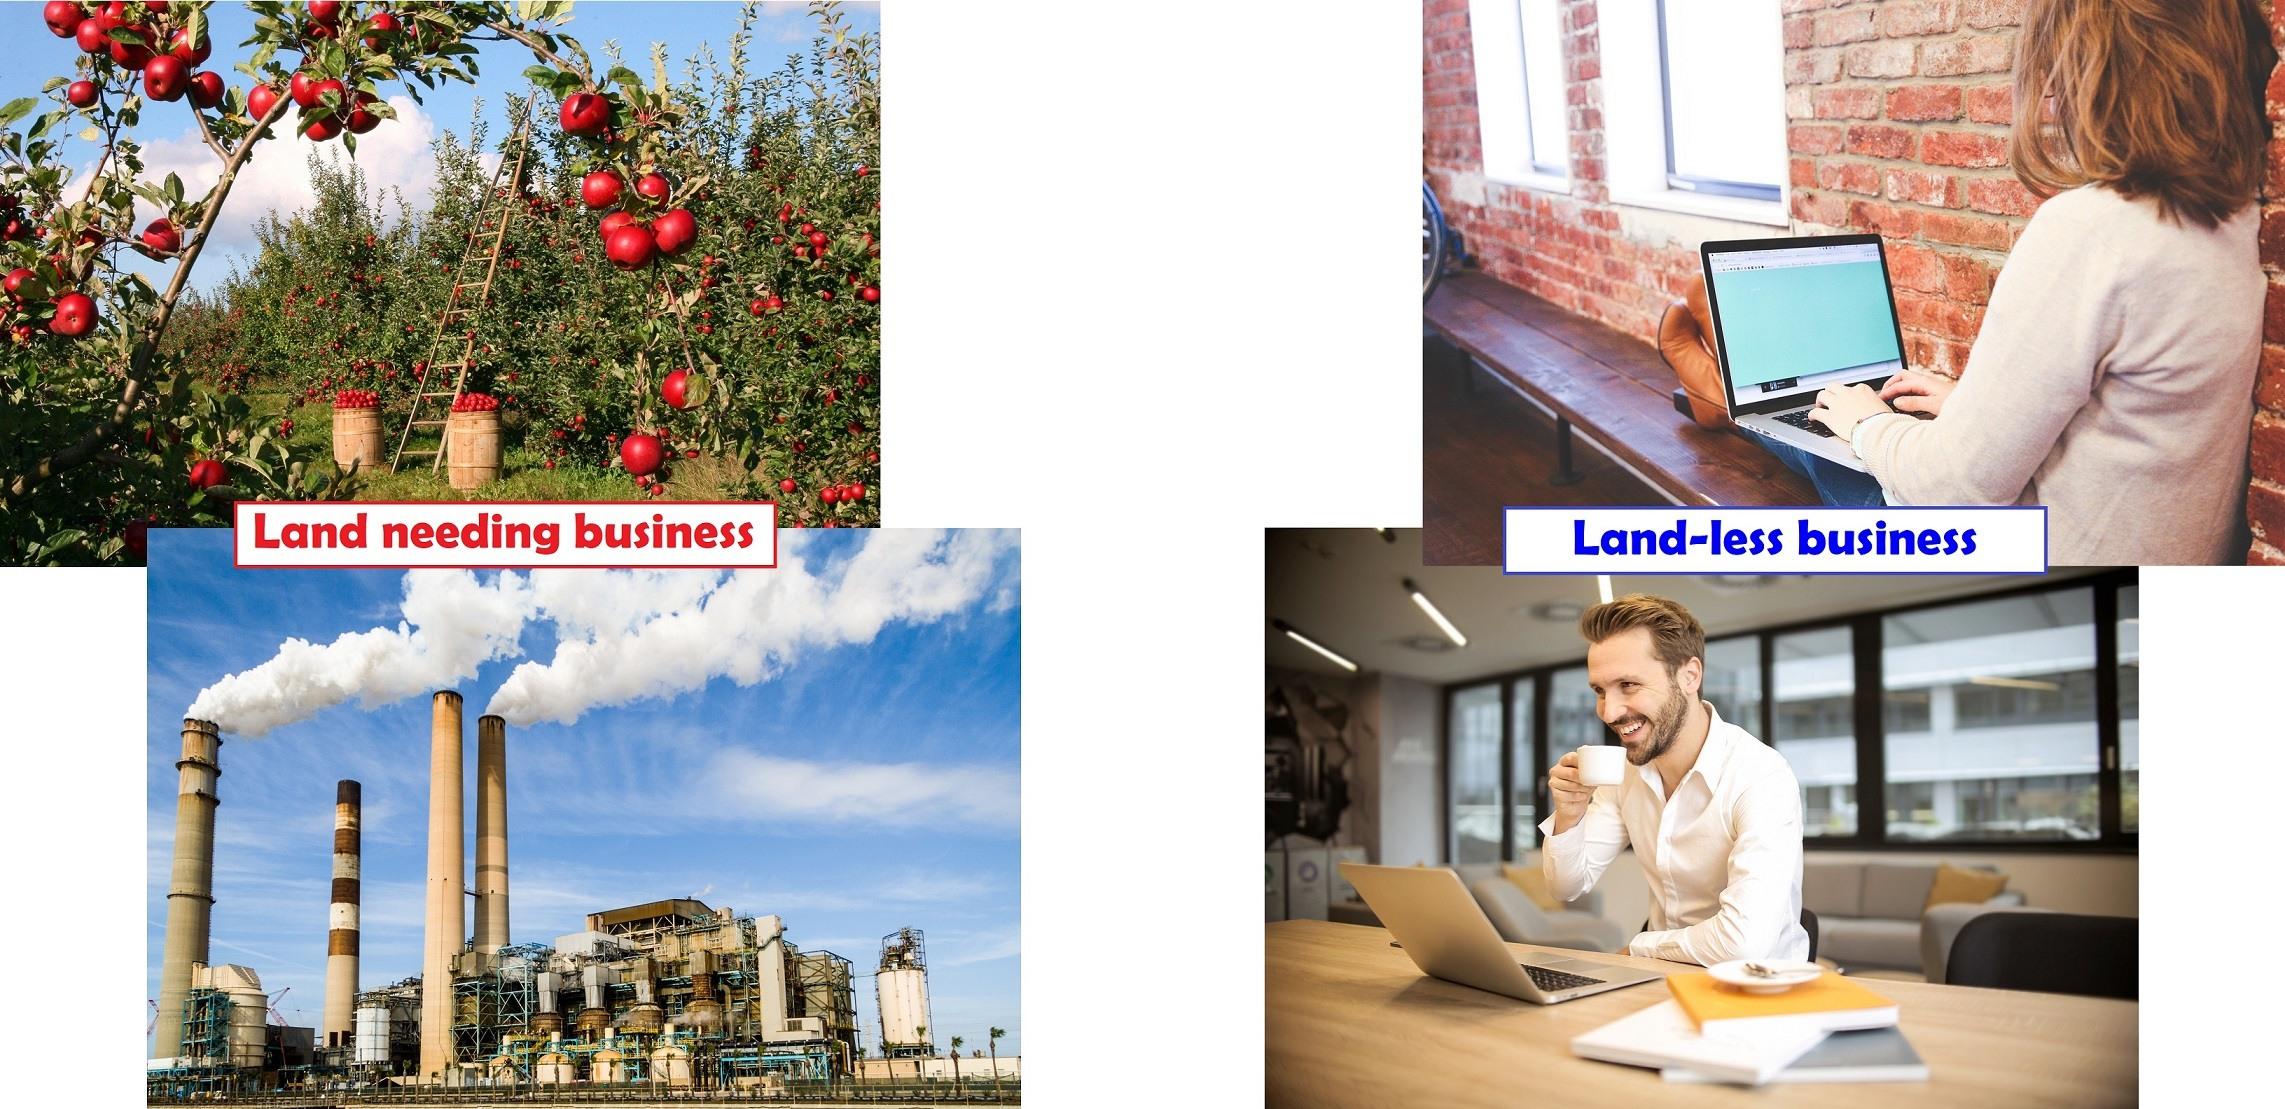 I Want A Business Idea - deciding land-needing or land-less